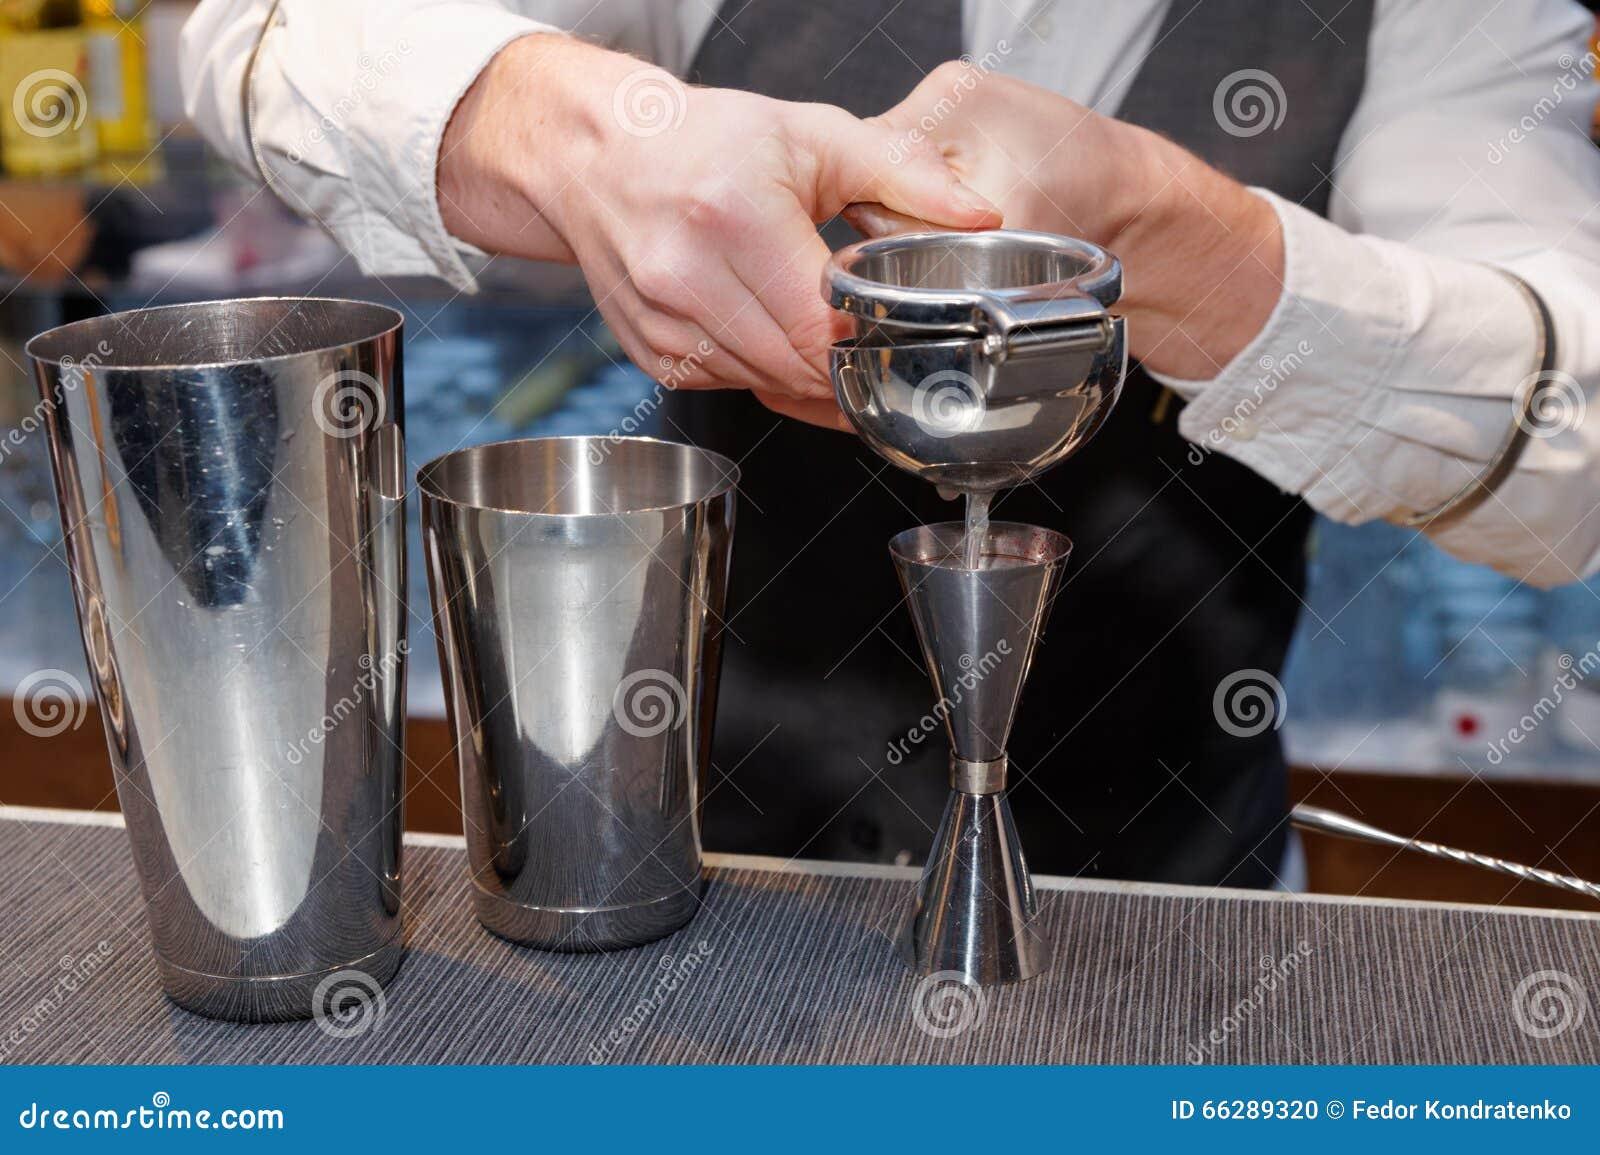 Bartender is squeezing citrus juice